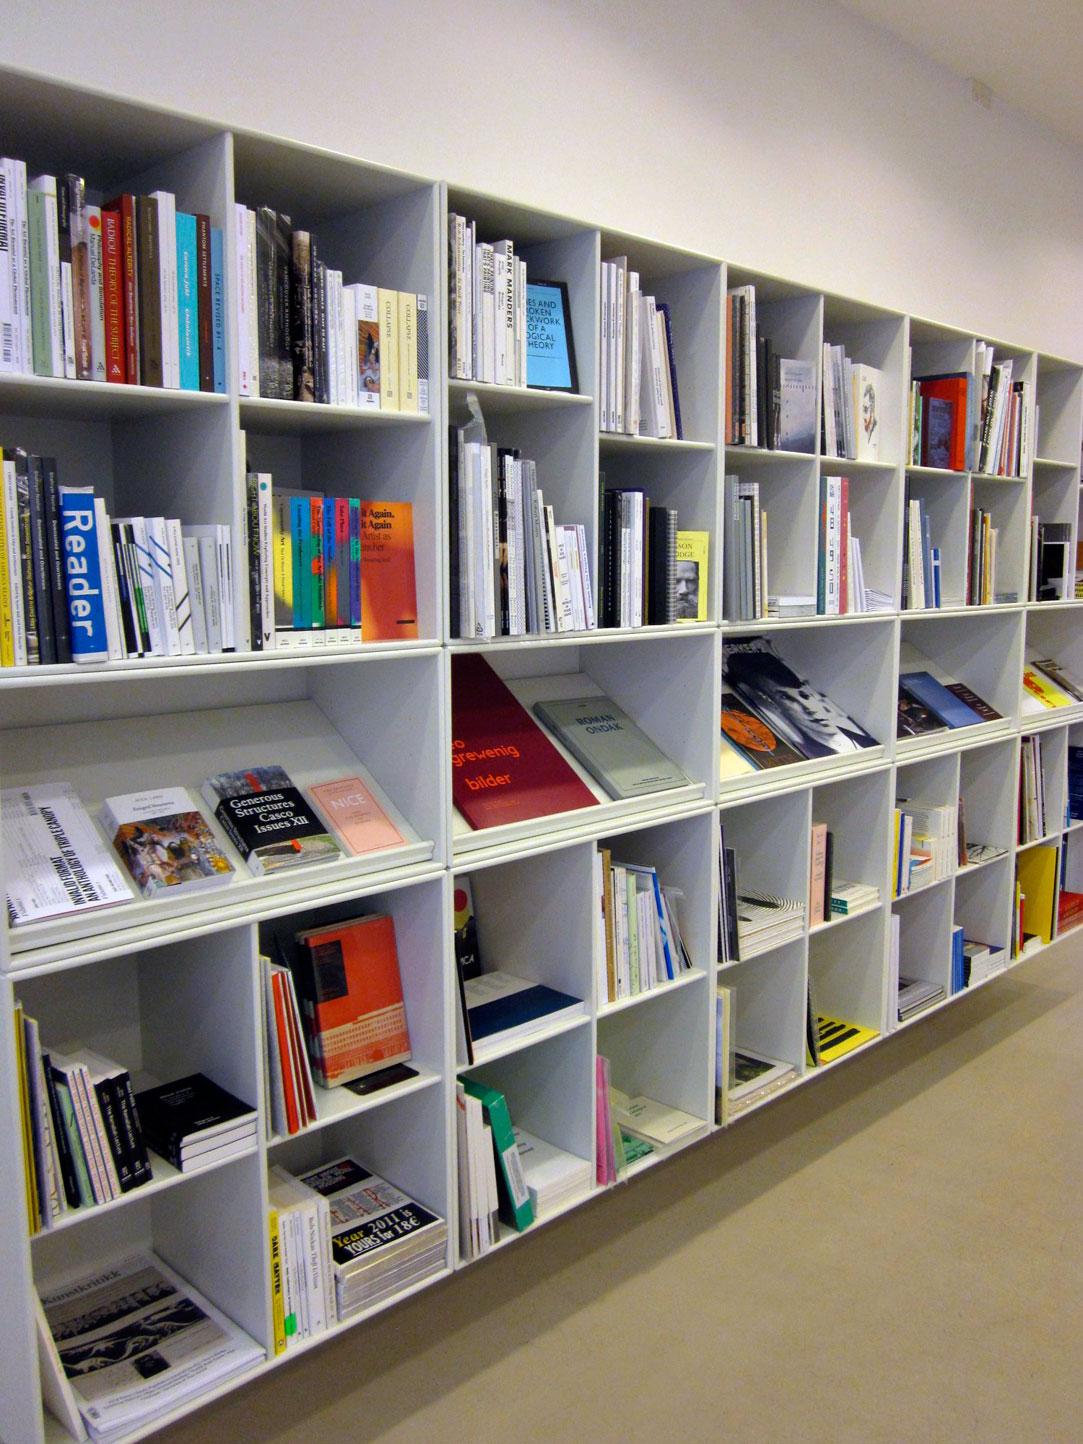 MOTTO DISTRIBUTION » Motto Charlottenborg: www.mottodistribution.com/site/?page_id=22582